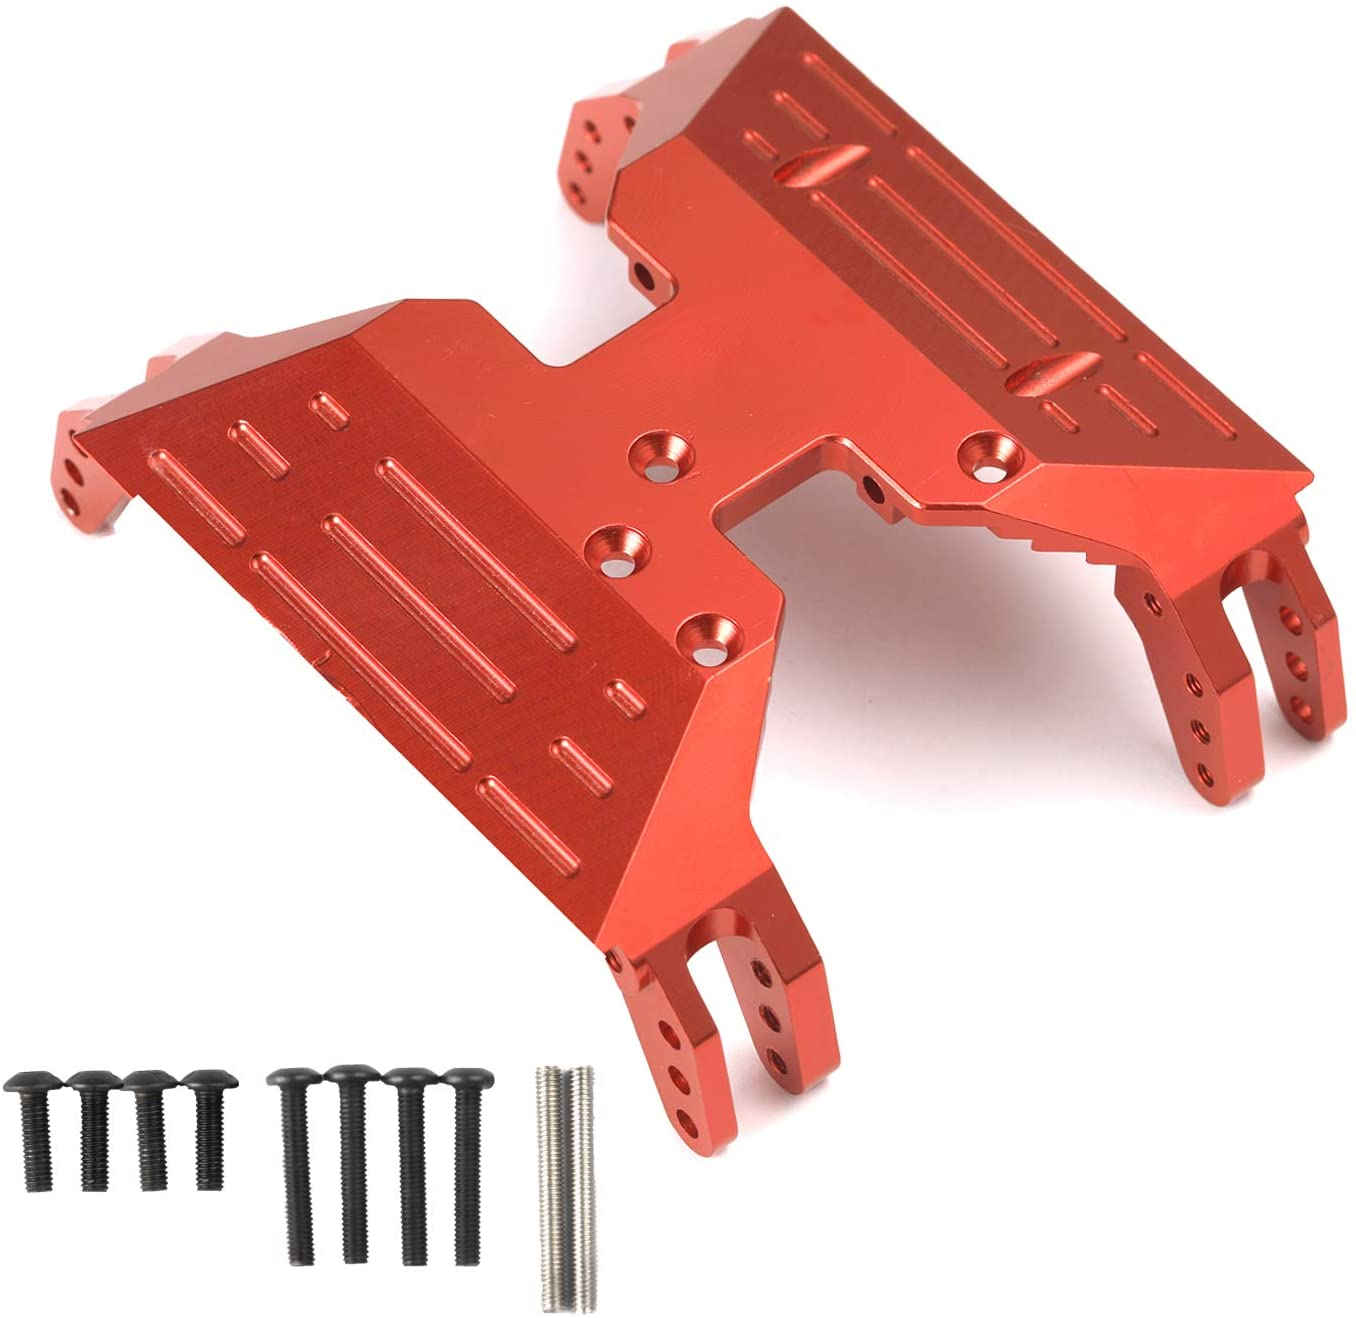 RZXYL Aluminum Centre Skid Plate for Axial Capra 1.9 UTB AXI03004 RC Crawler Car Upgrade Parts (Red)